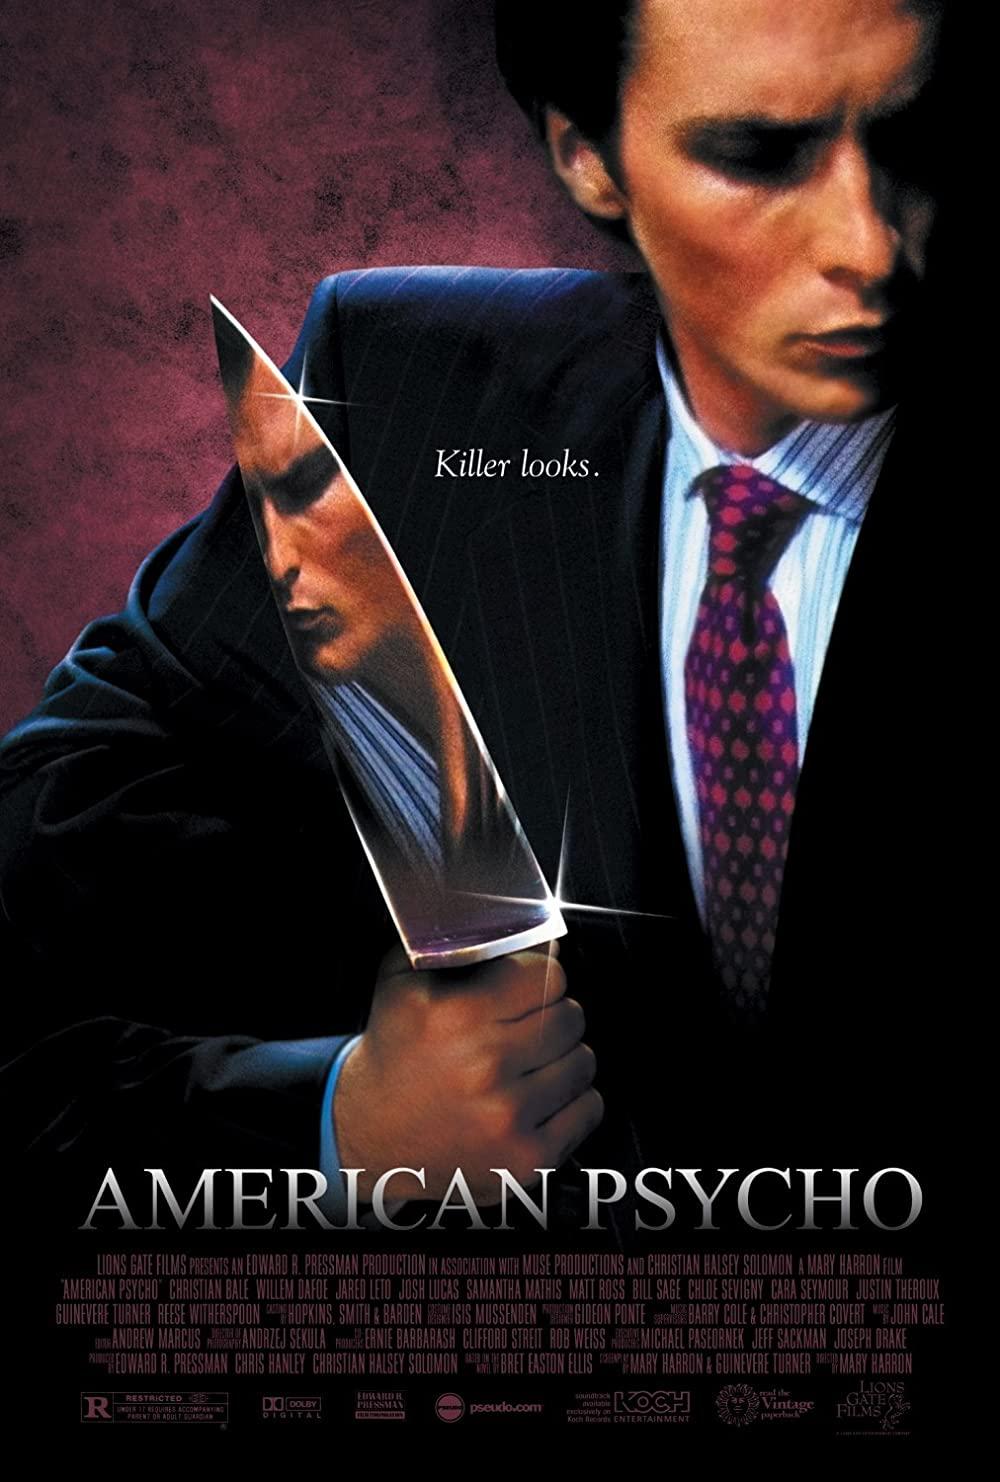 American Psycho 2000 Spoilers And Bloopers Imdb